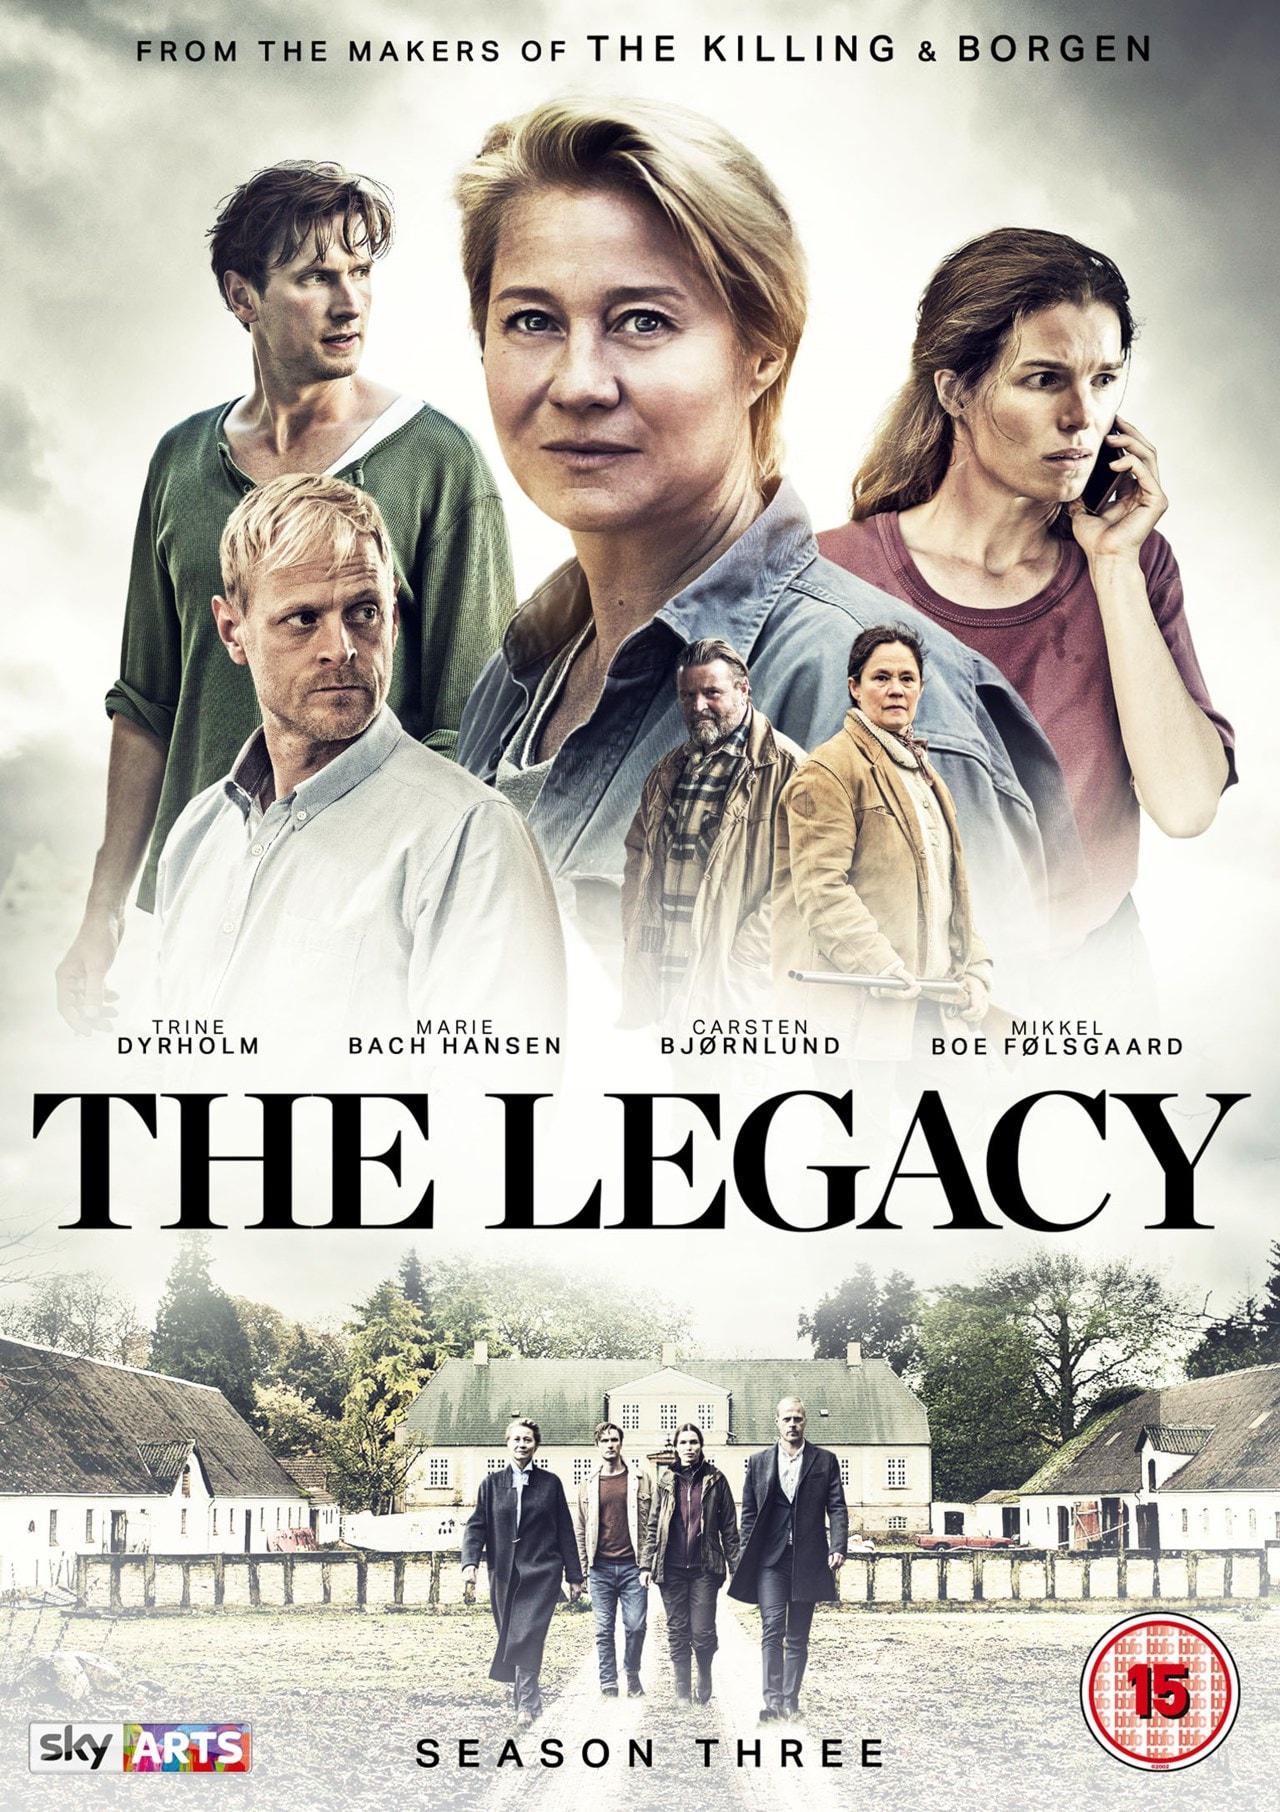 The Legacy: Season 3 - 1